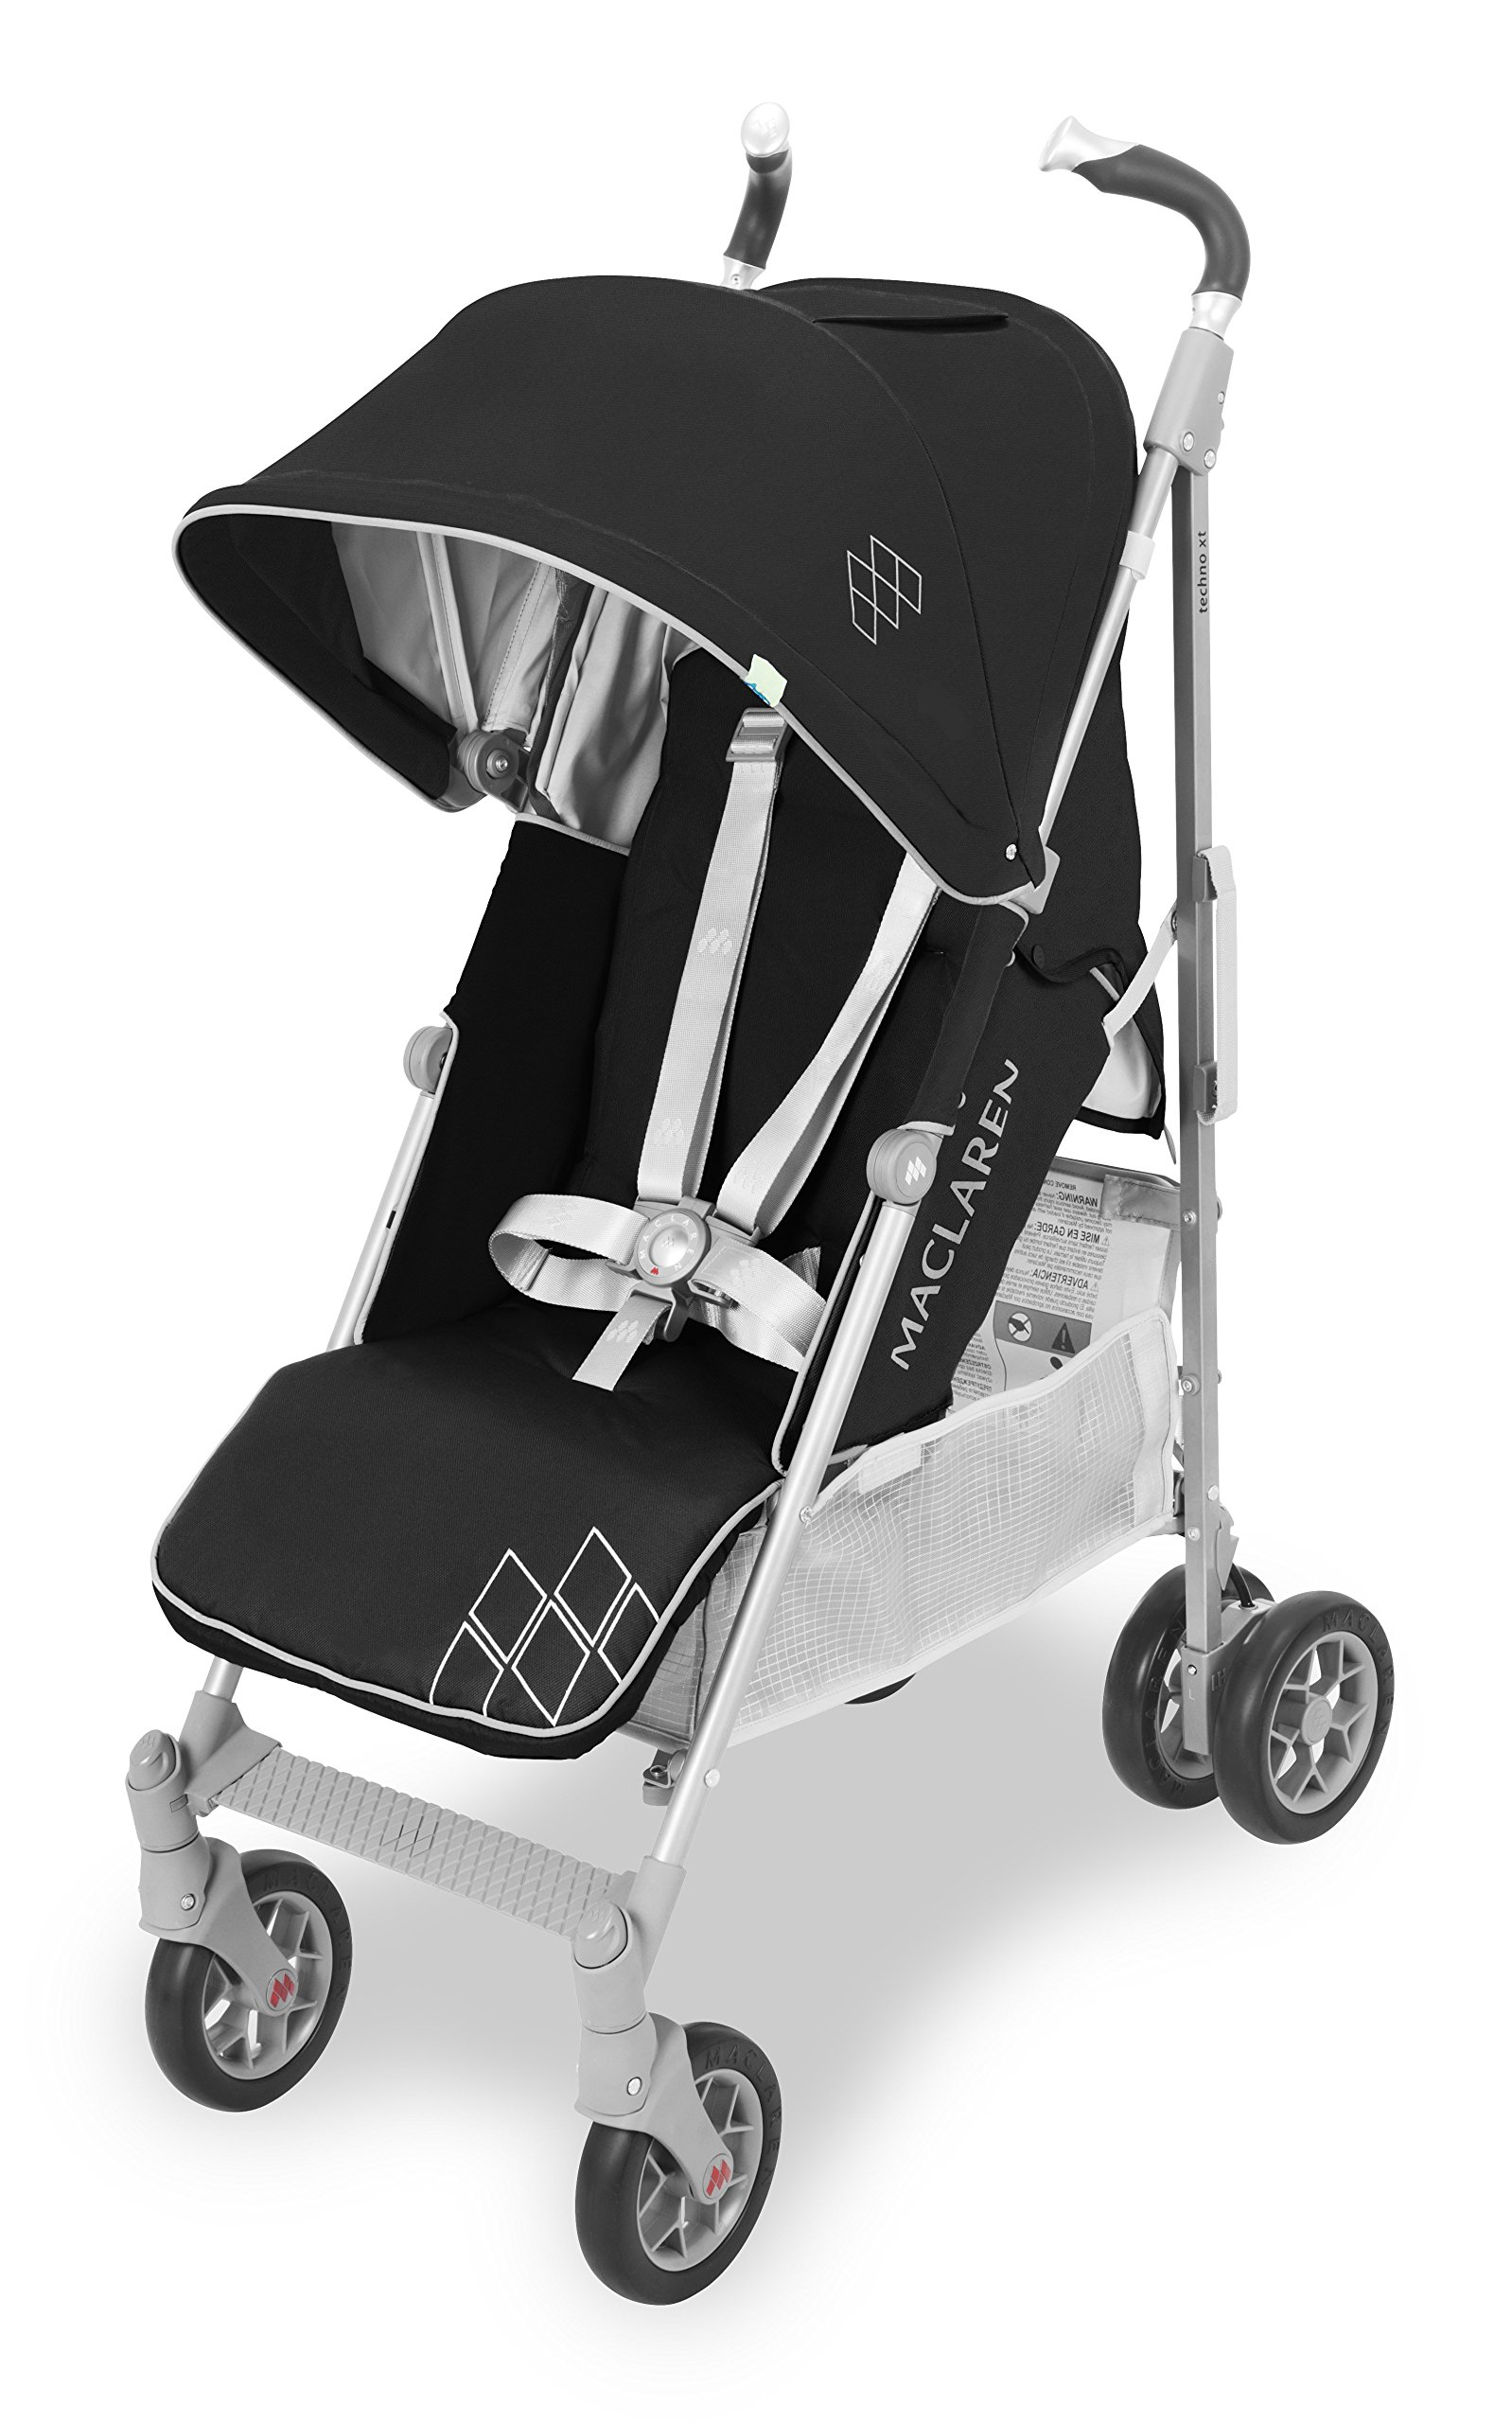 Maclaren Techno XT - Silla de paseo, color negro y gris product image